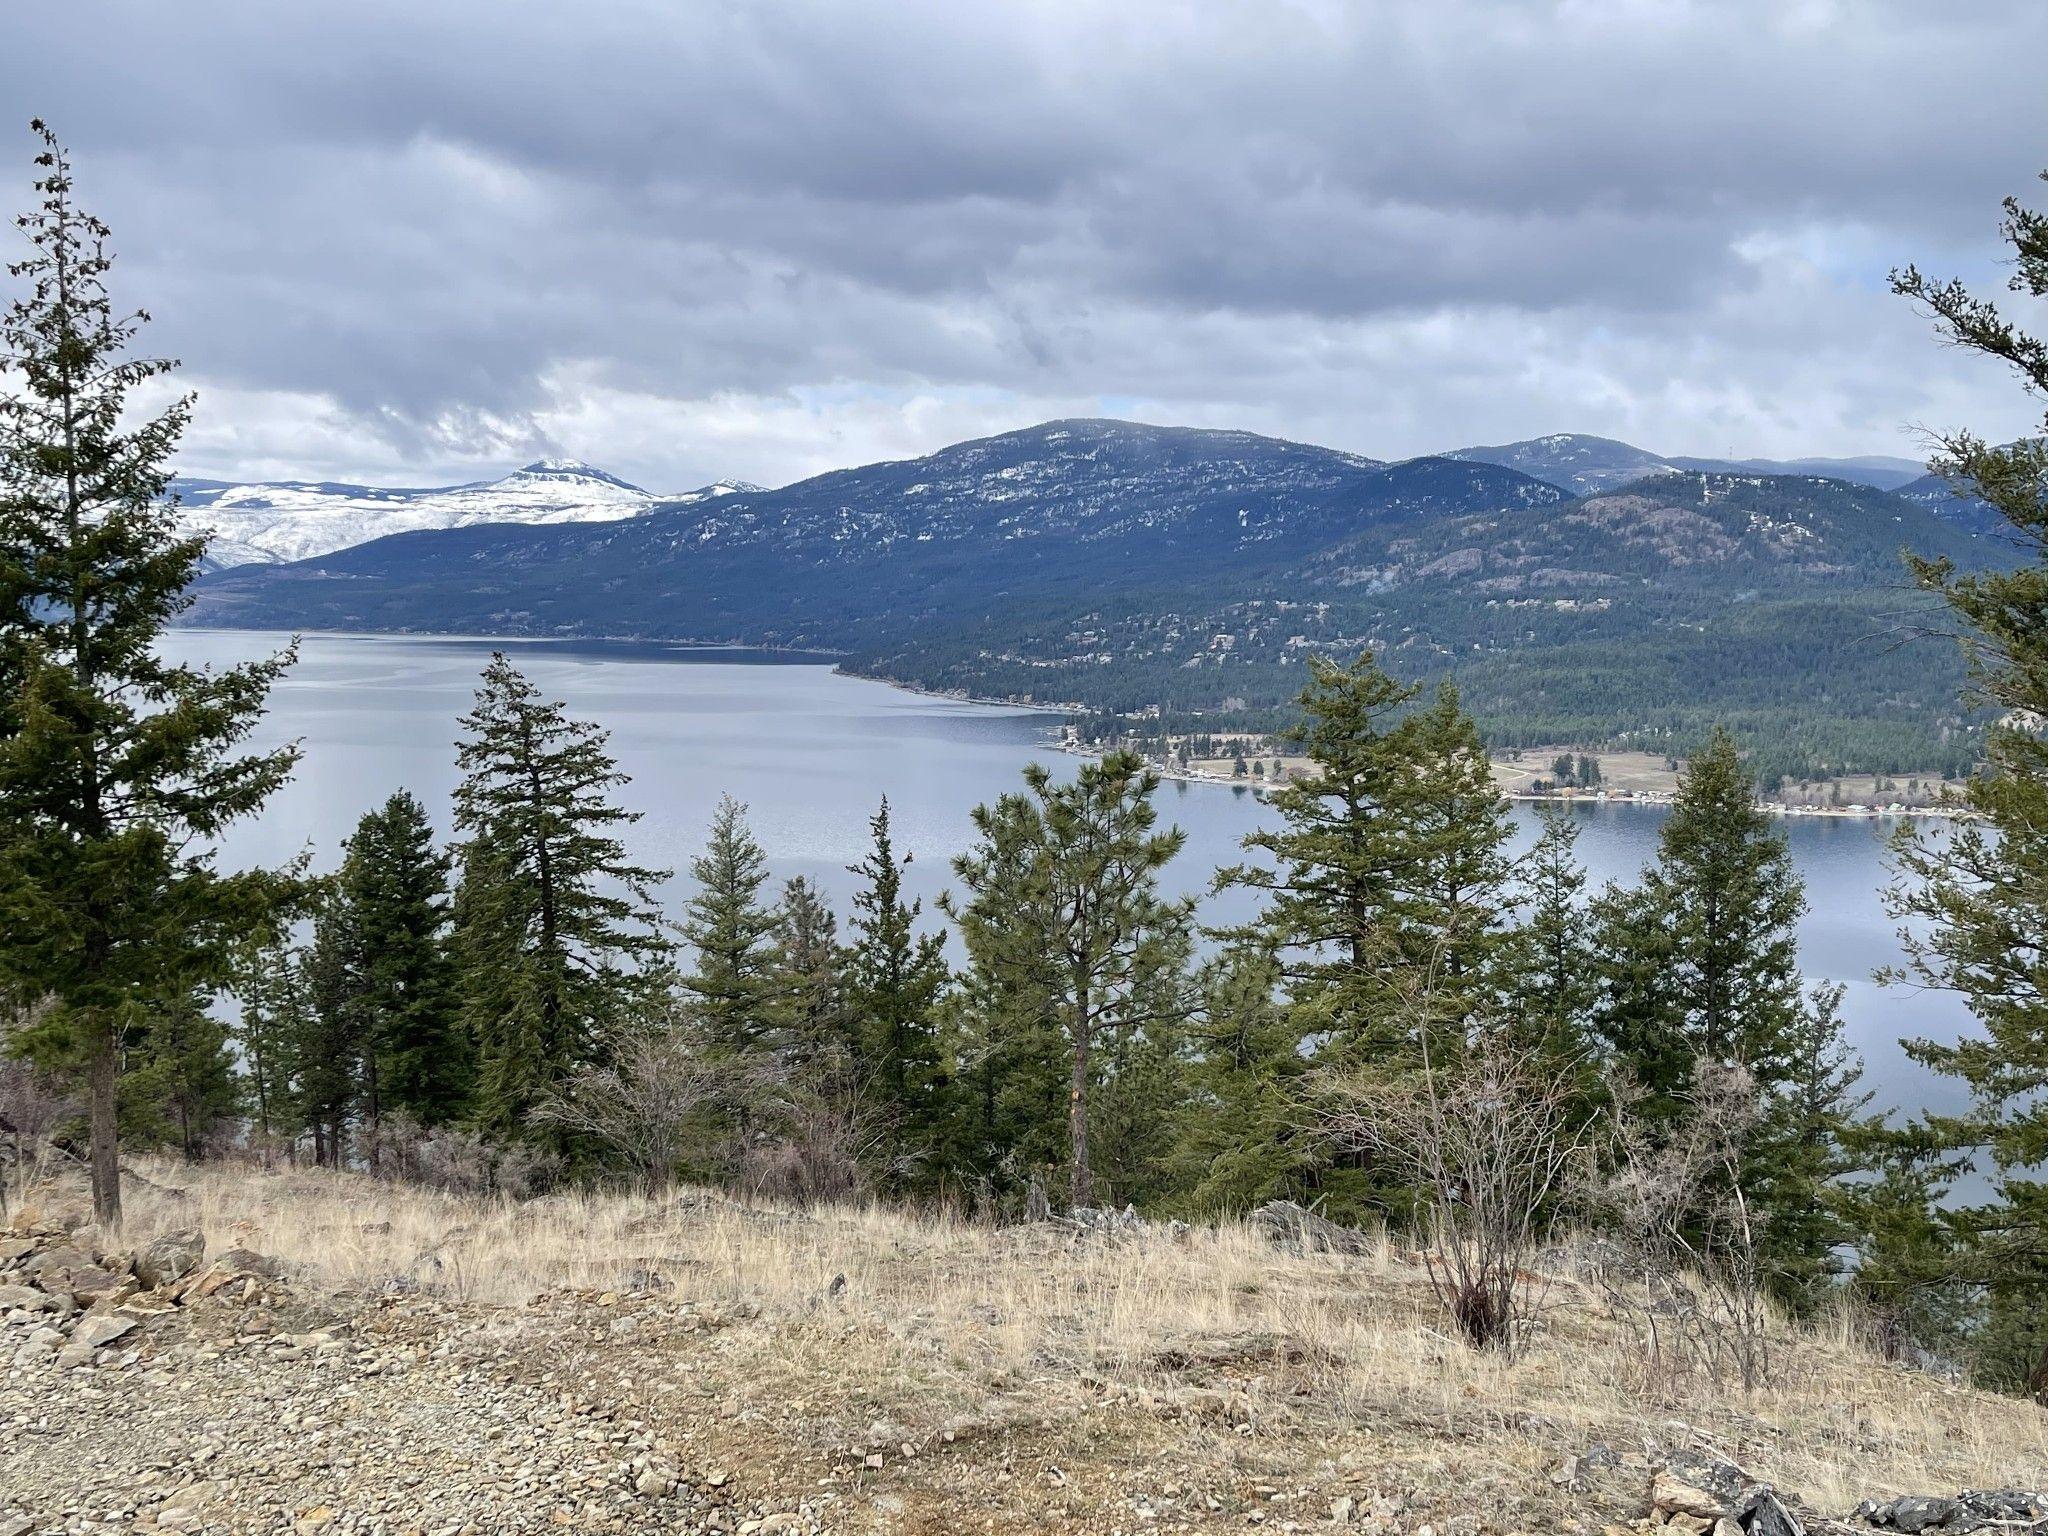 Main Photo: 9026 Tavistock Road in Vernon: Adventure Bay Vacant Land for sale (North Okanagan)  : MLS®# 10228474